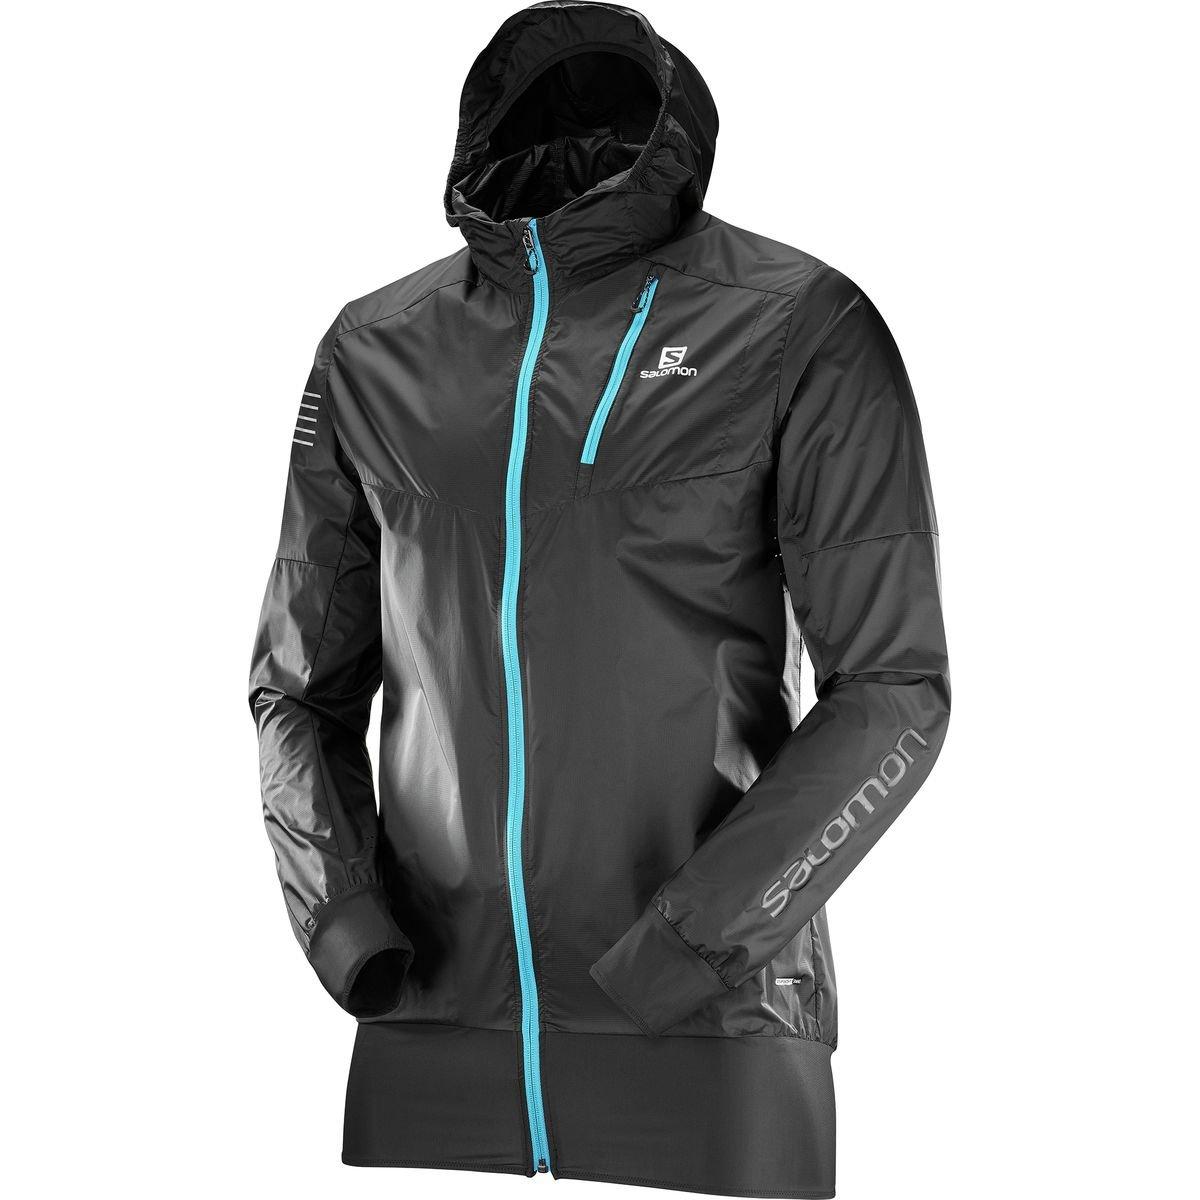 Salomon Men's Fast Wing Hybrid Jacket, Black, Medium by Salomon